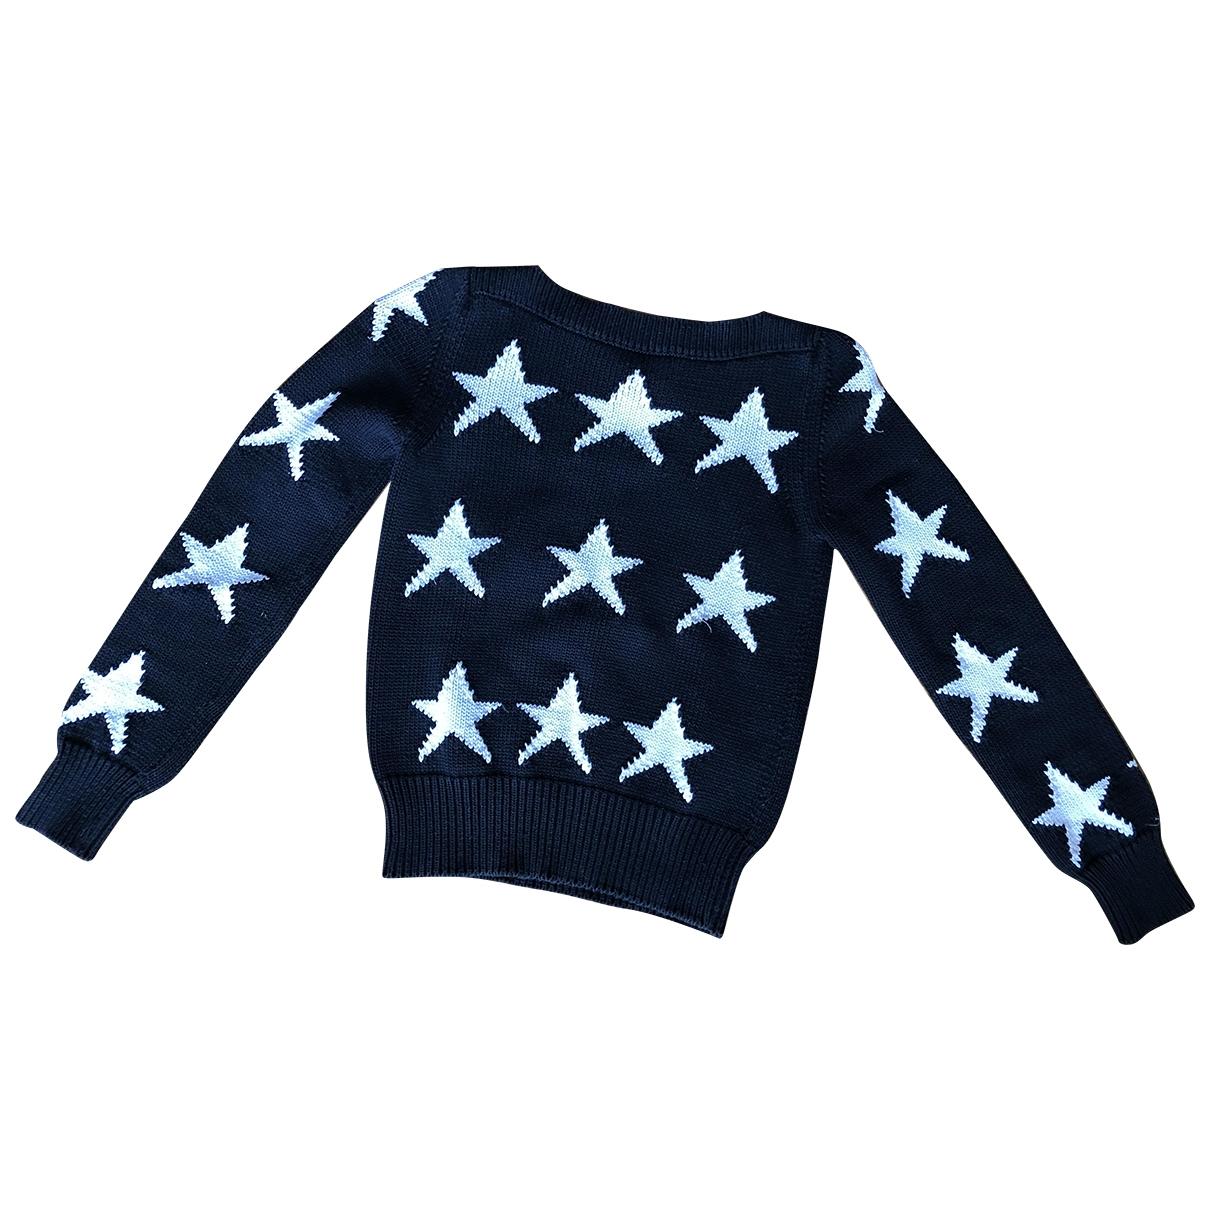 Max Mara \N Blue Cotton Knitwear for Women S International